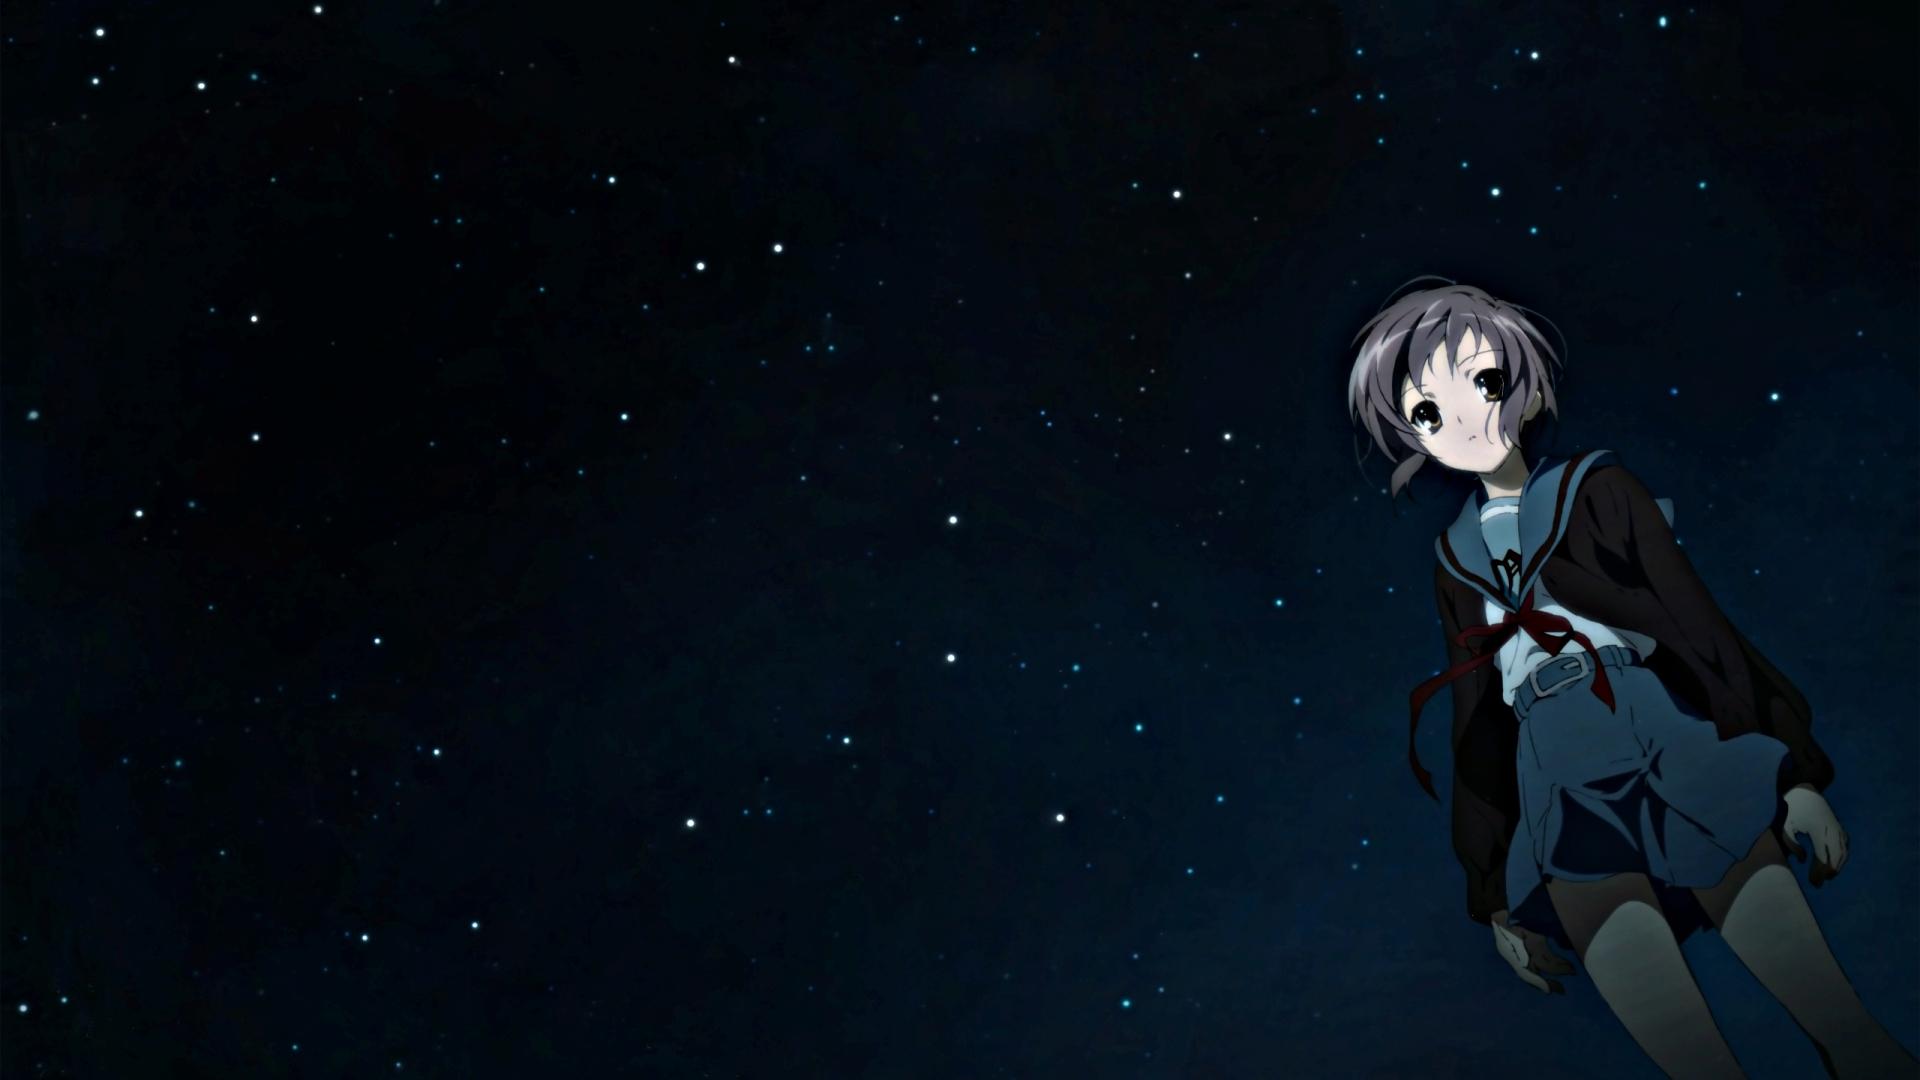 1920x1080 anime, night, sky 1080P Laptop Full HD Wallpaper ...